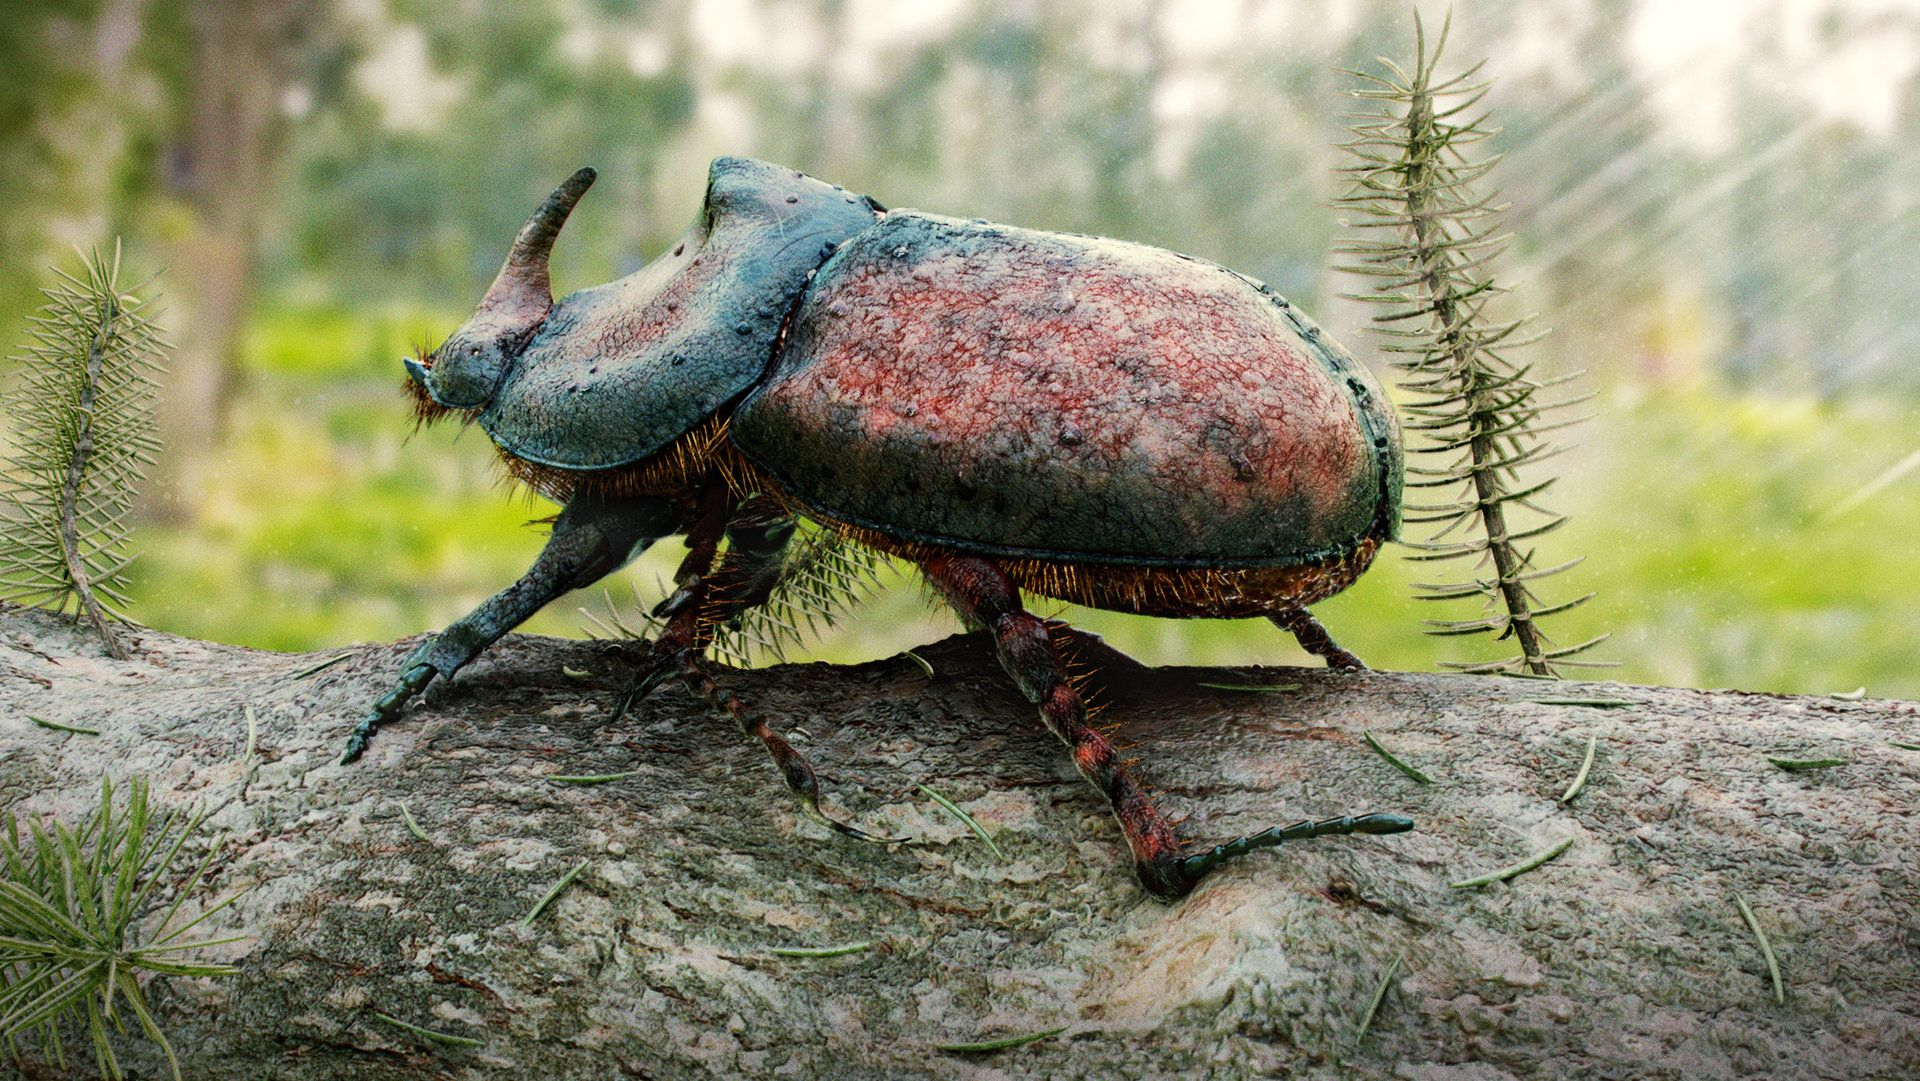 Jonathanvardstedteuropeanrhinocerosbeetlesummerg